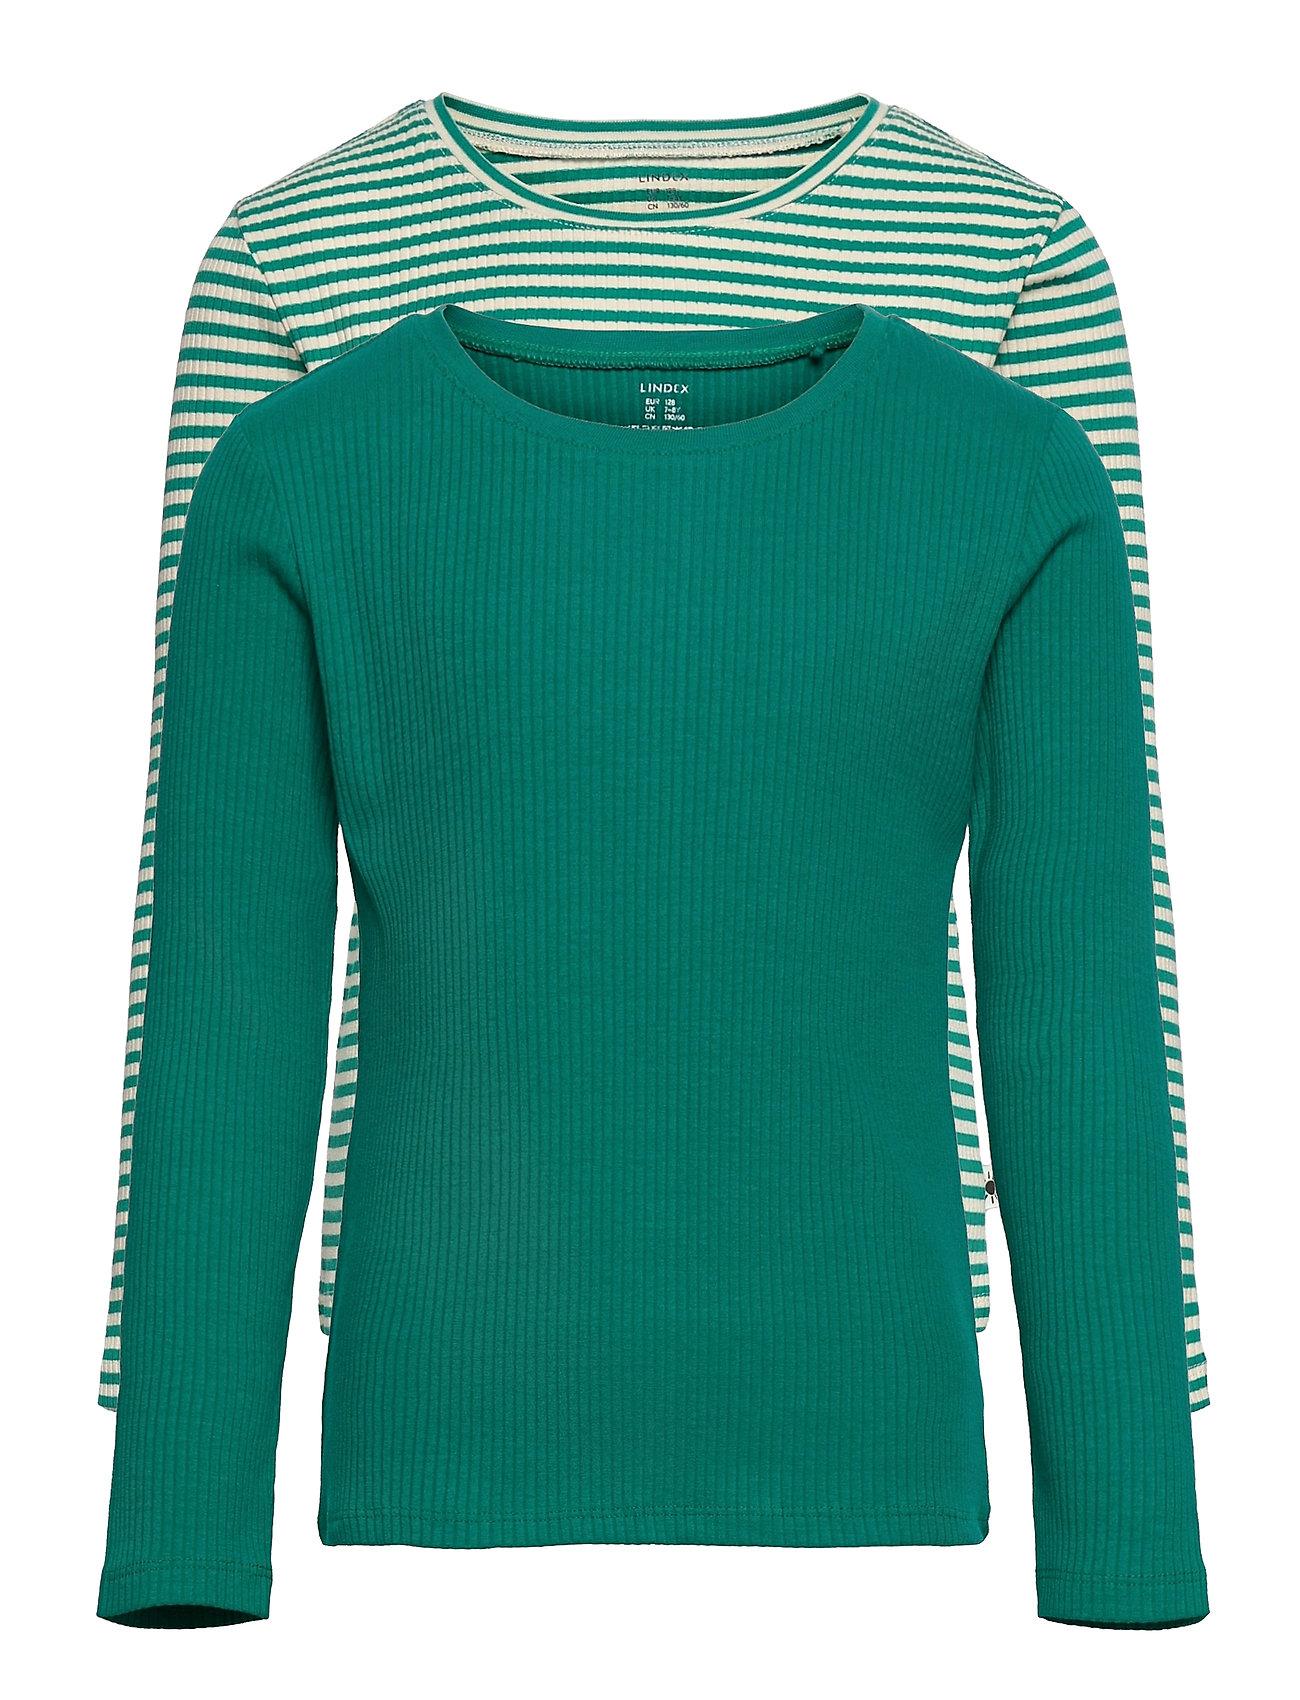 Top Basic Rib Y D Solid 2 Pack Langærmet T-shirt Grøn Lindex